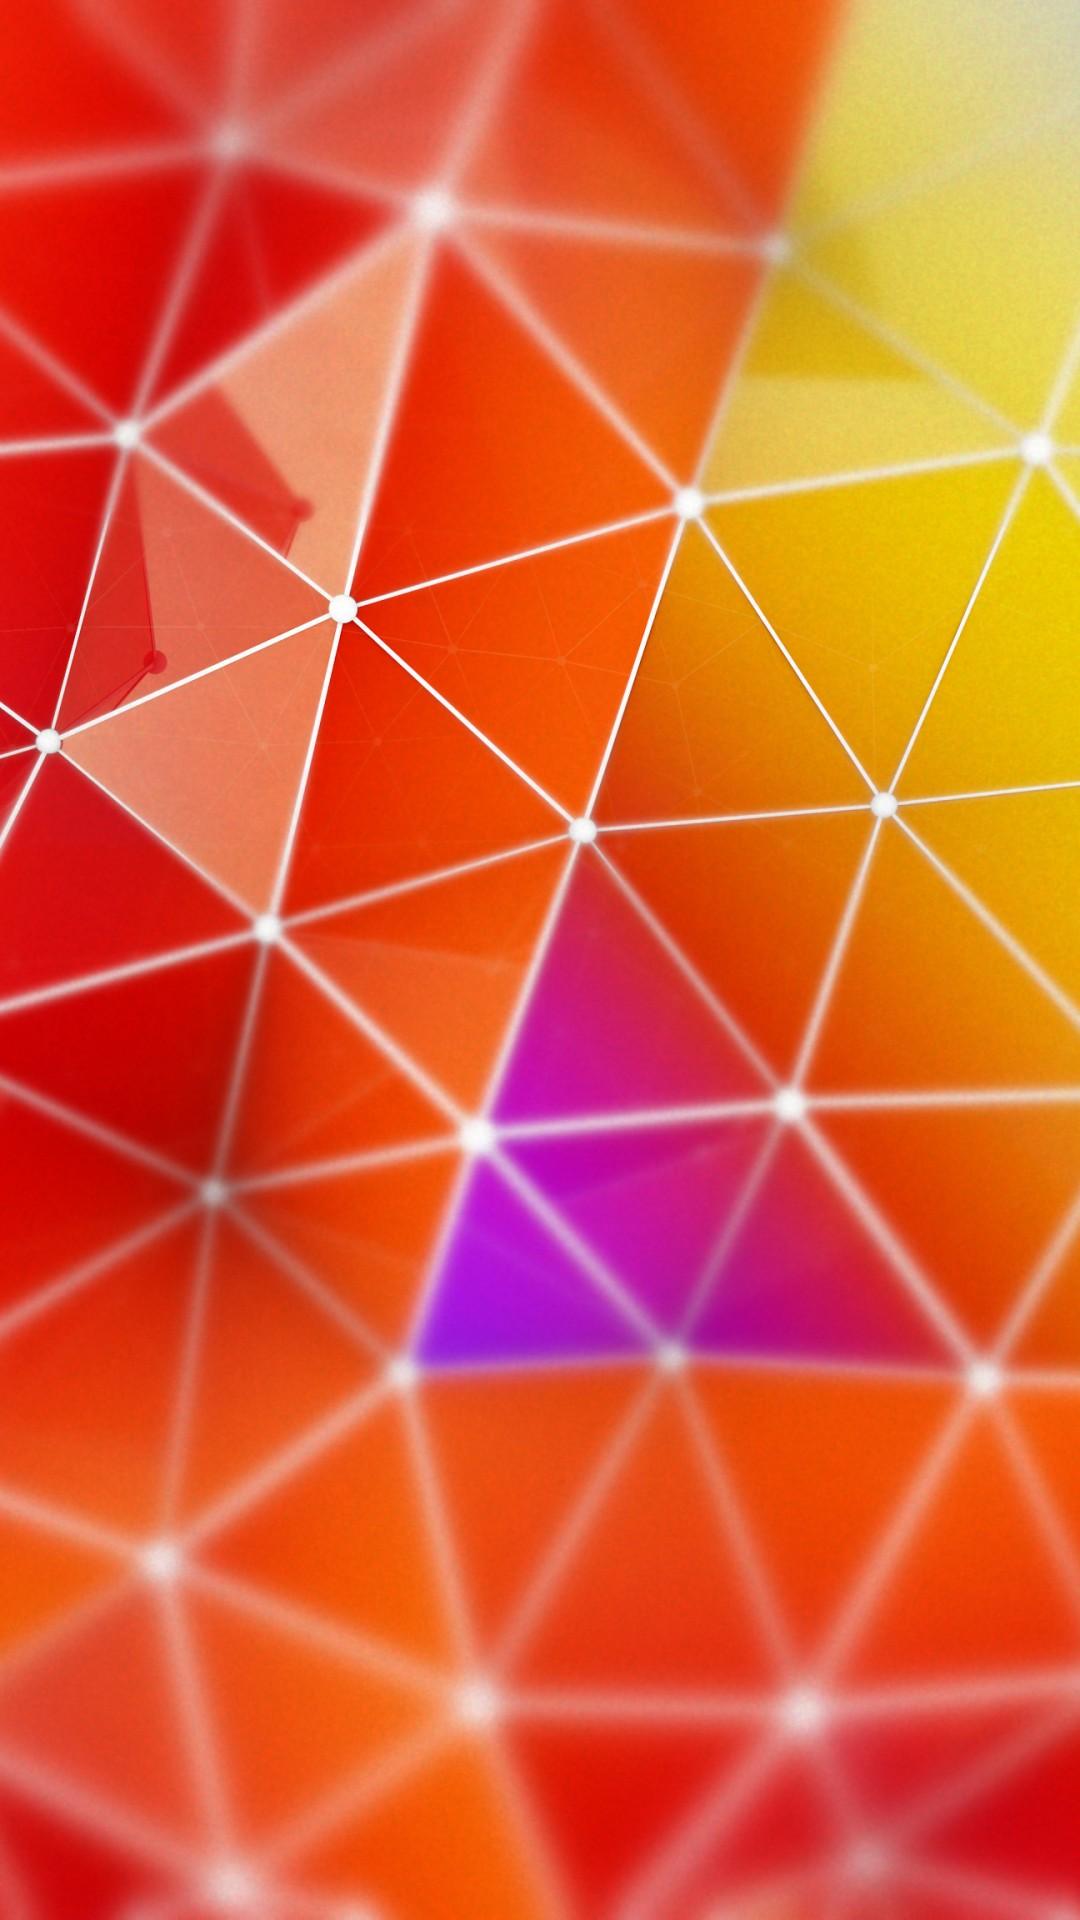 Wallpaper polygon, 4k, 5k wallpaper, orange, red, blue ...